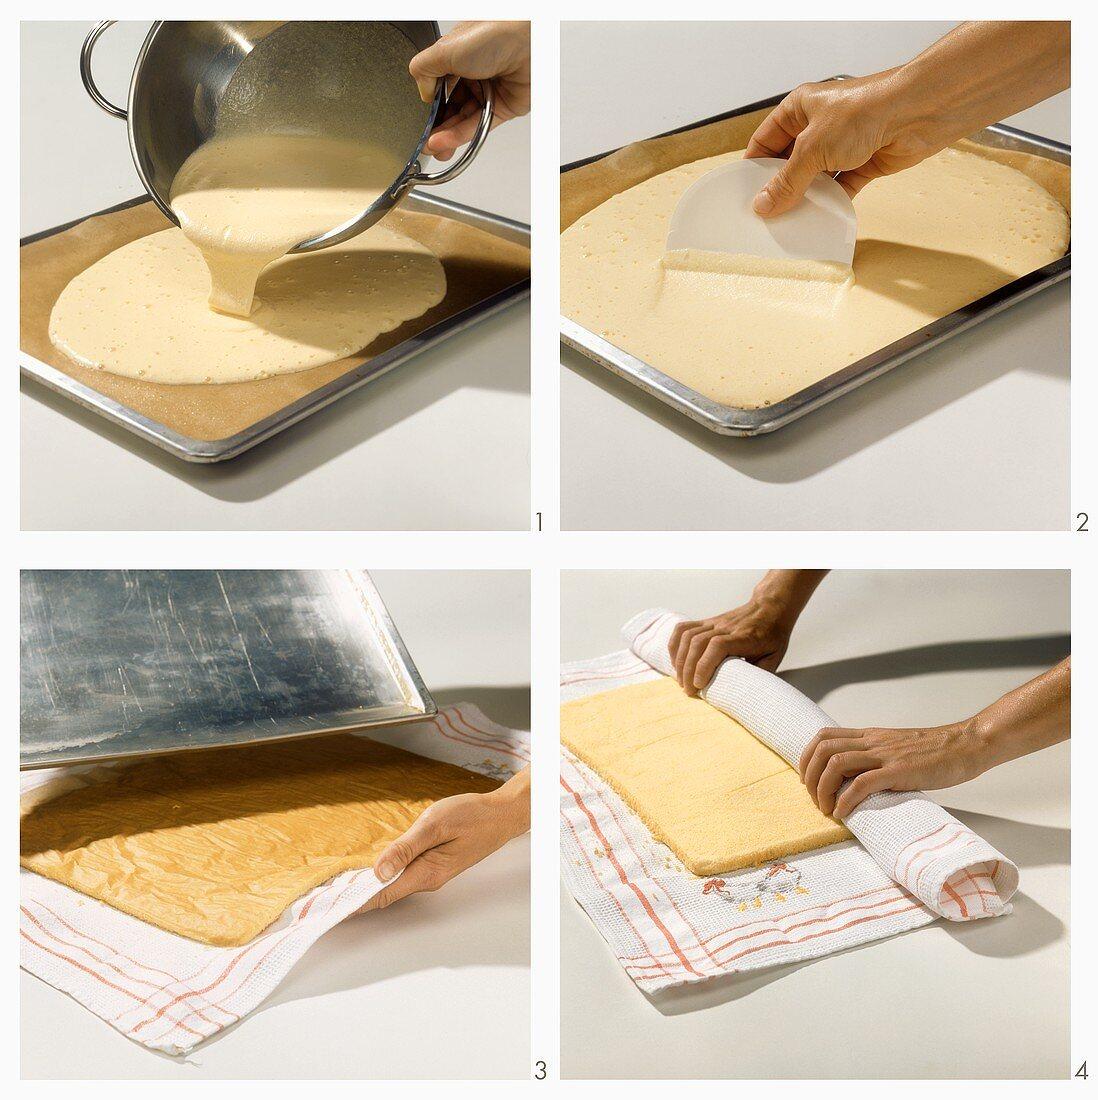 Making fatless sponge mixture